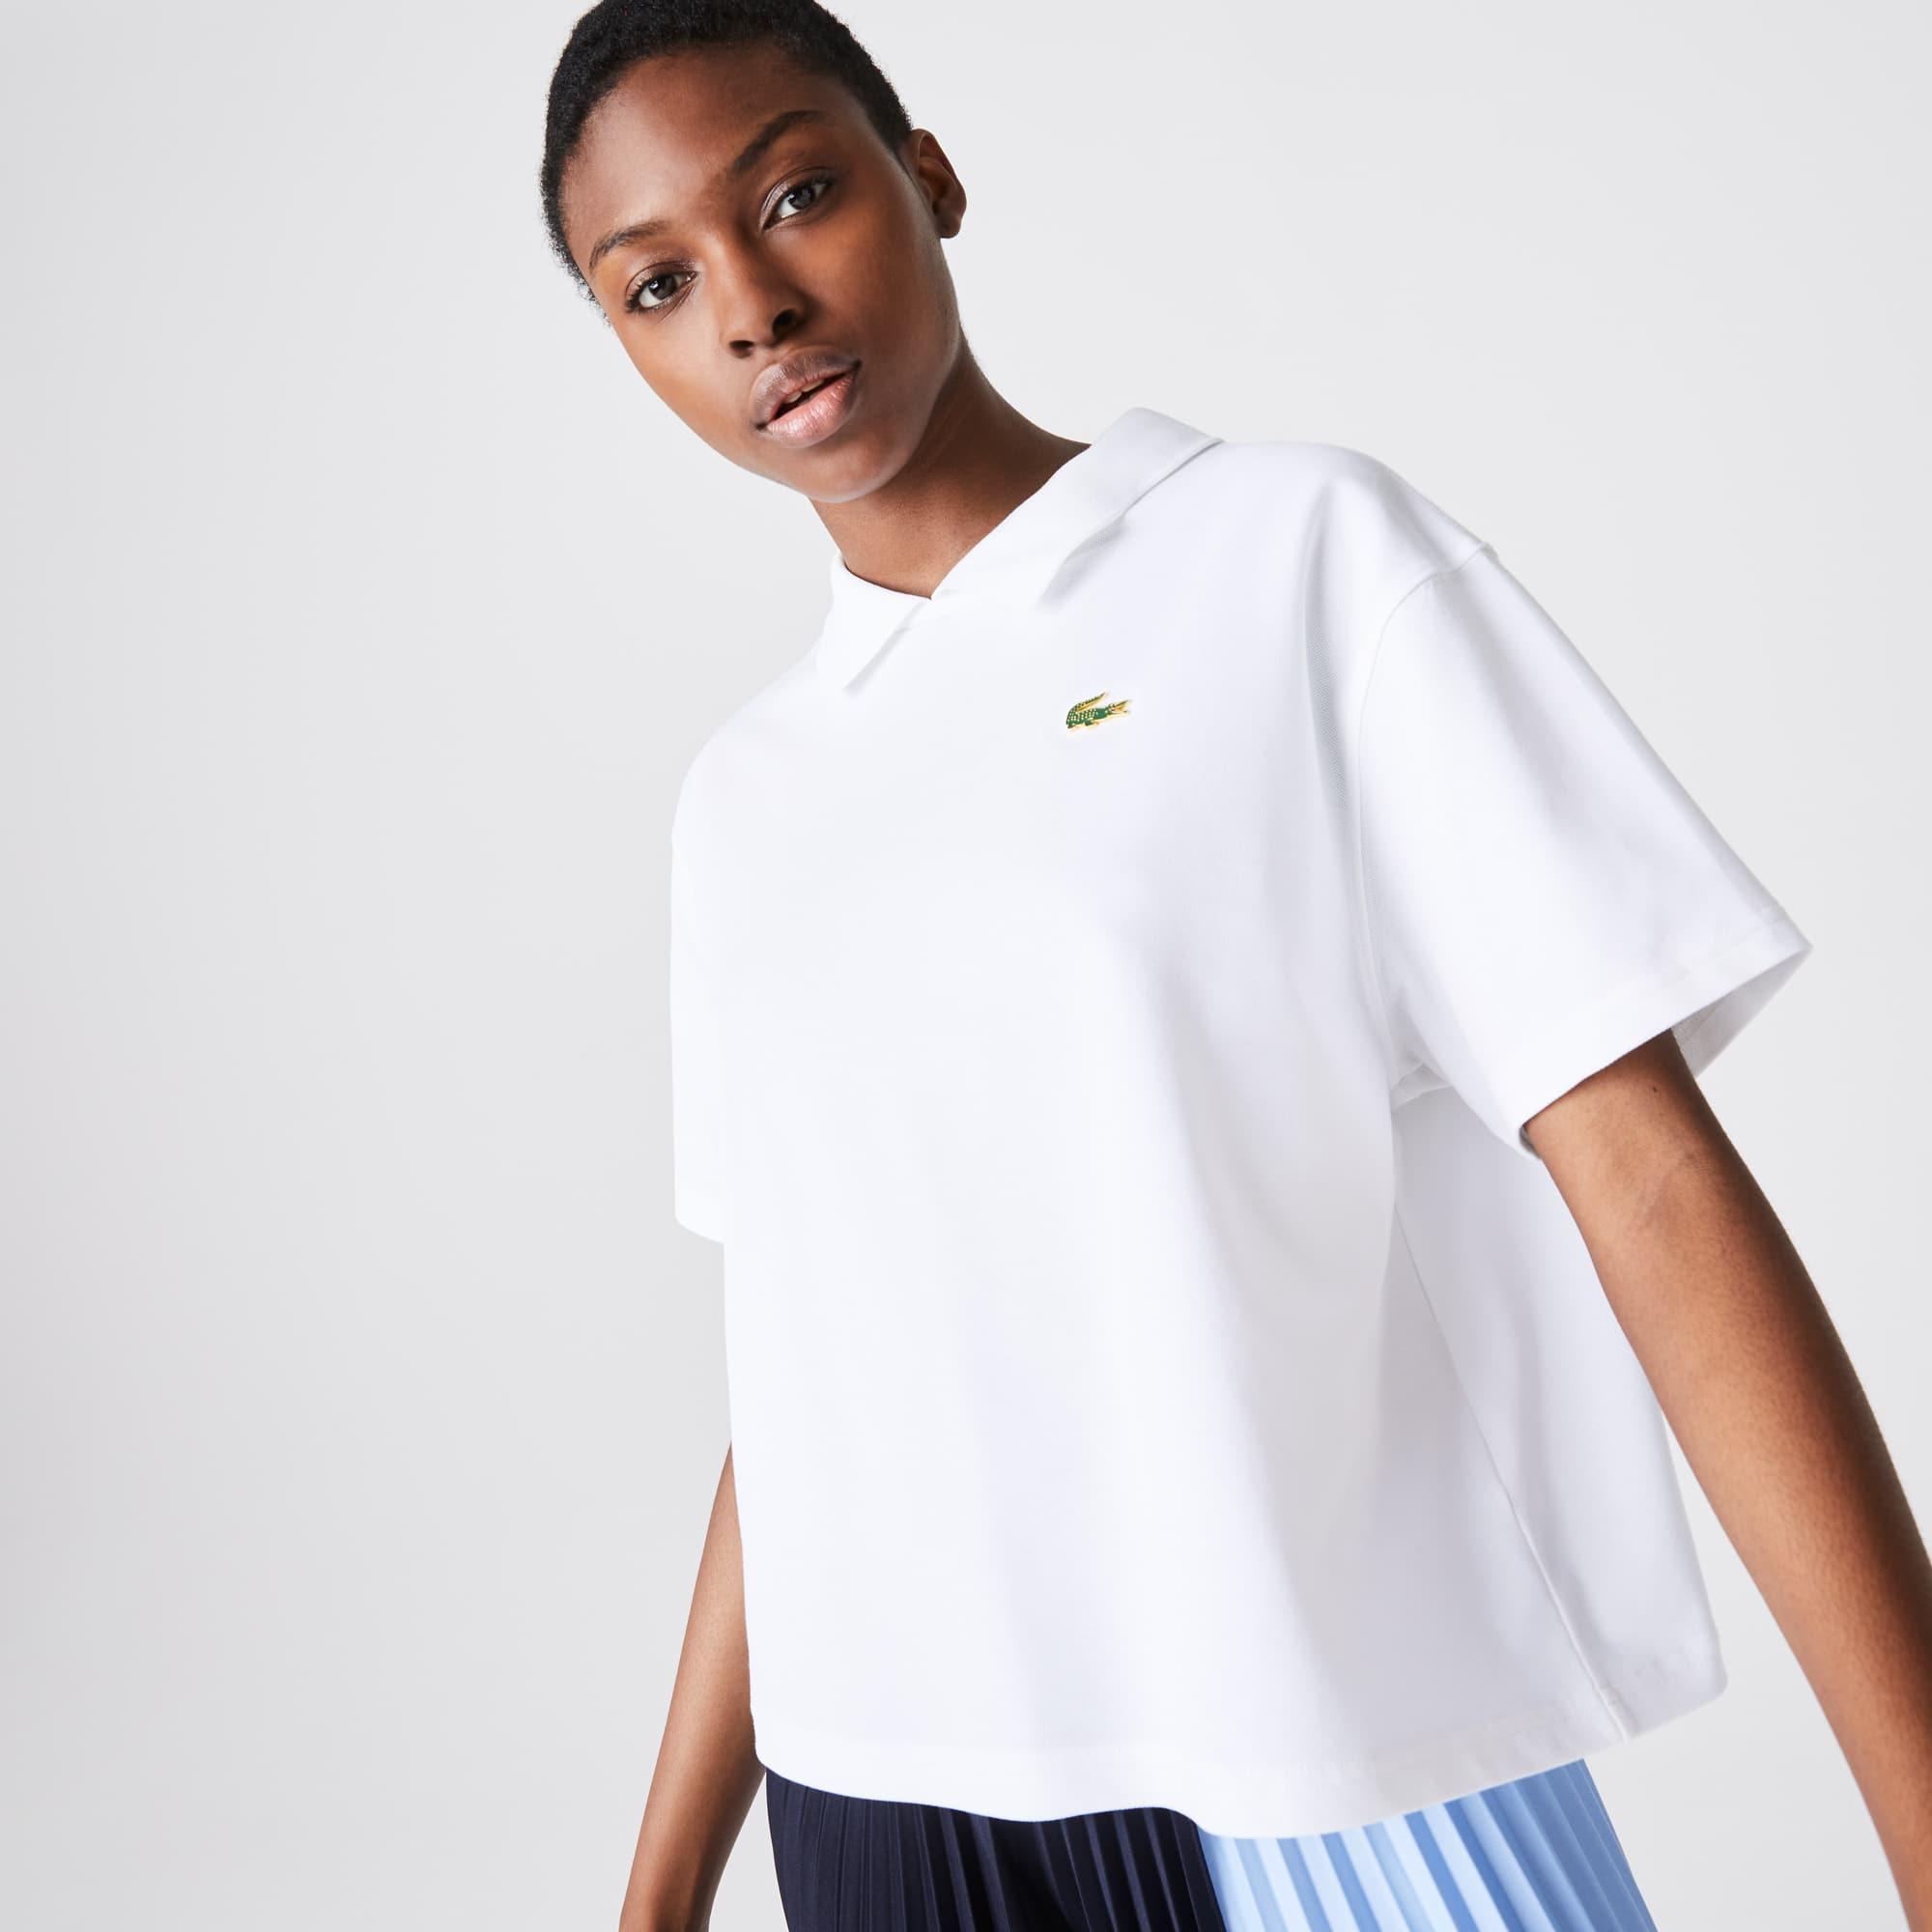 Lacoste Women's LIVE Boxy Fit Stretch Cotton Pique Polo Shirt